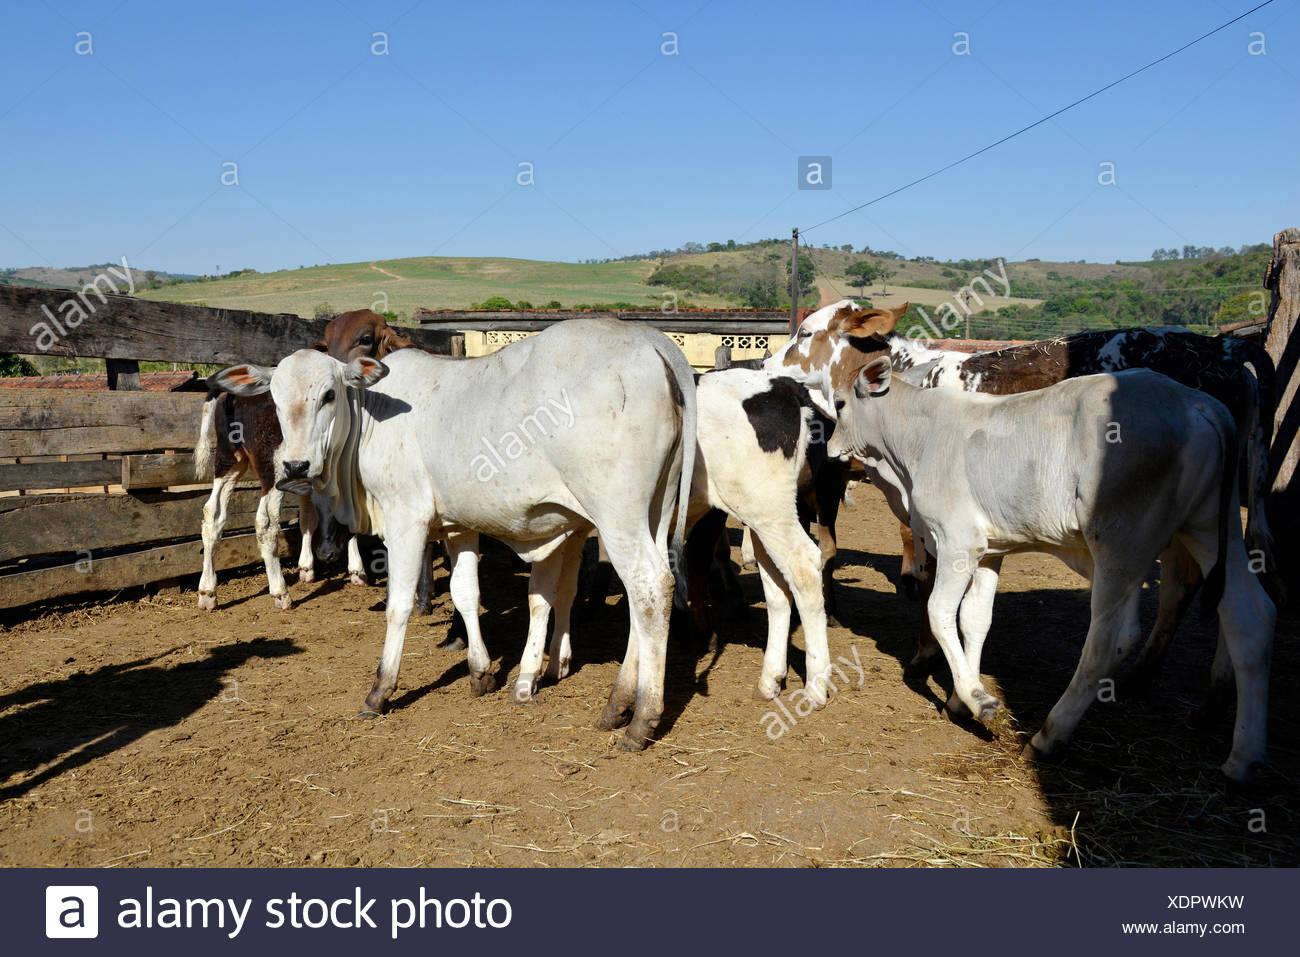 Bristle Cattle Stock Photos & Bristle Cattle Stock Images